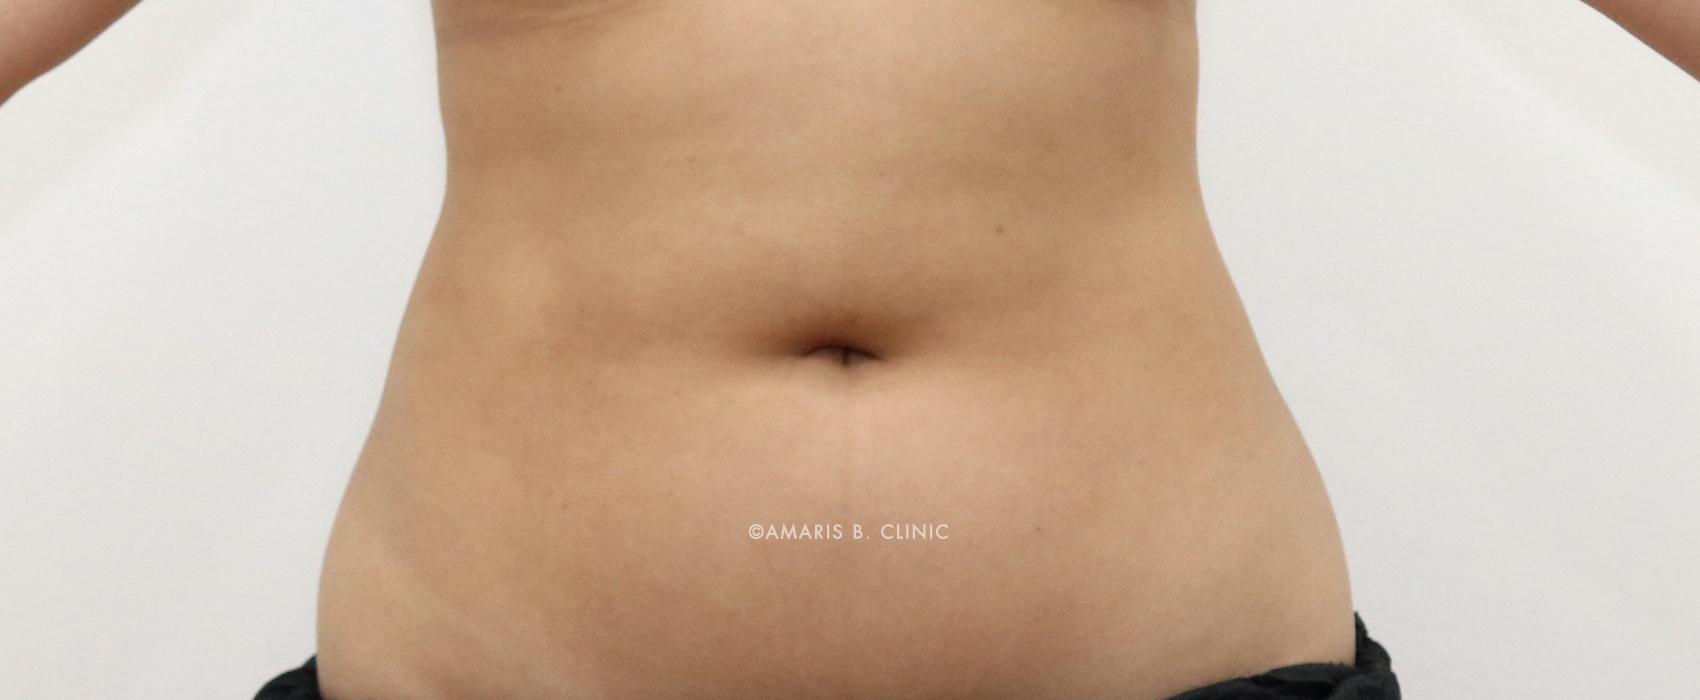 Aesthetic & Cosmetic Procedure Myths